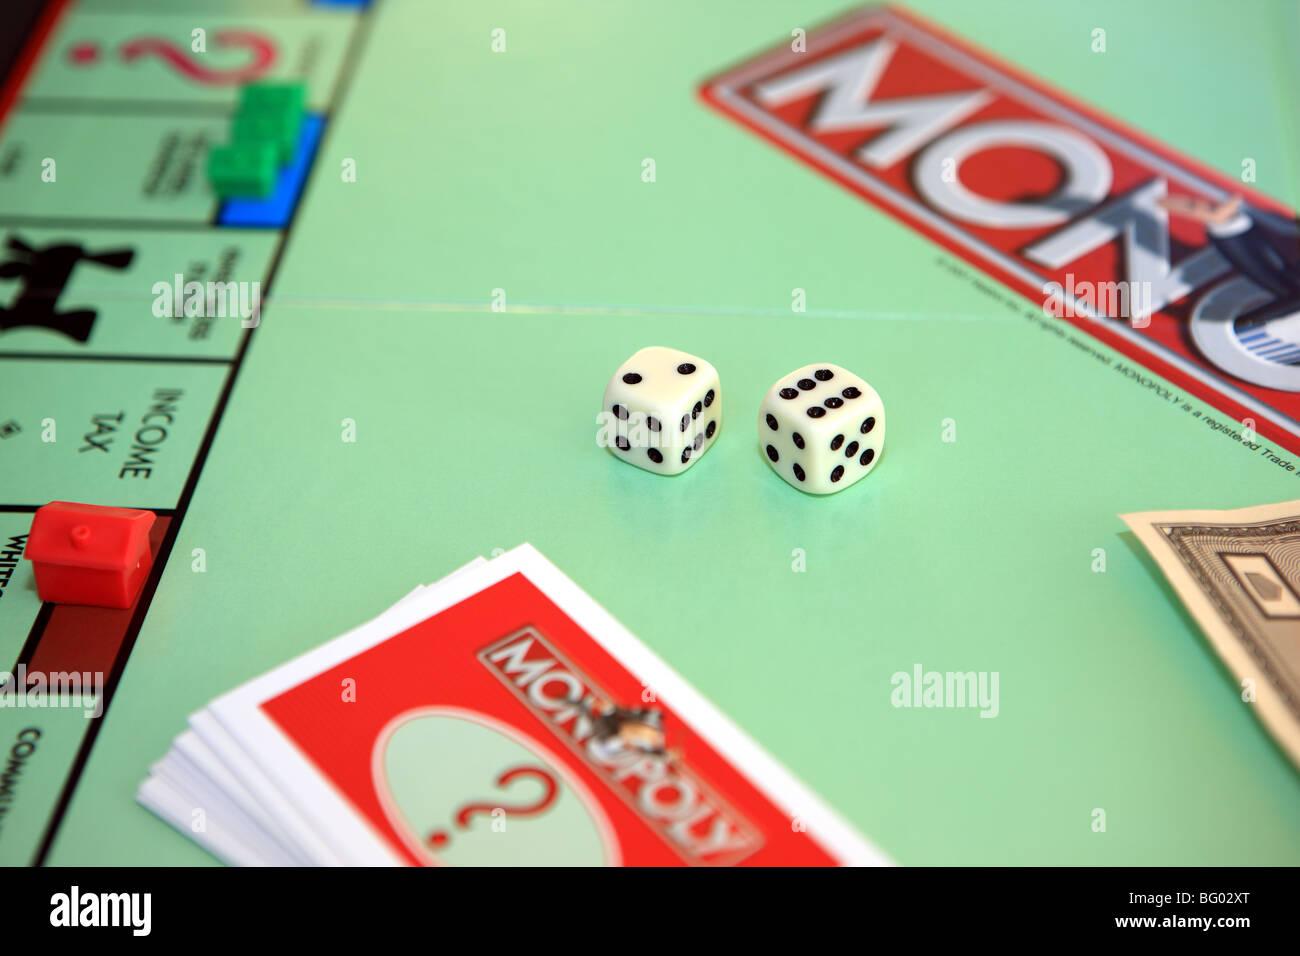 Monopoly Game Imagenes De Stock Monopoly Game Fotos De Stock Alamy